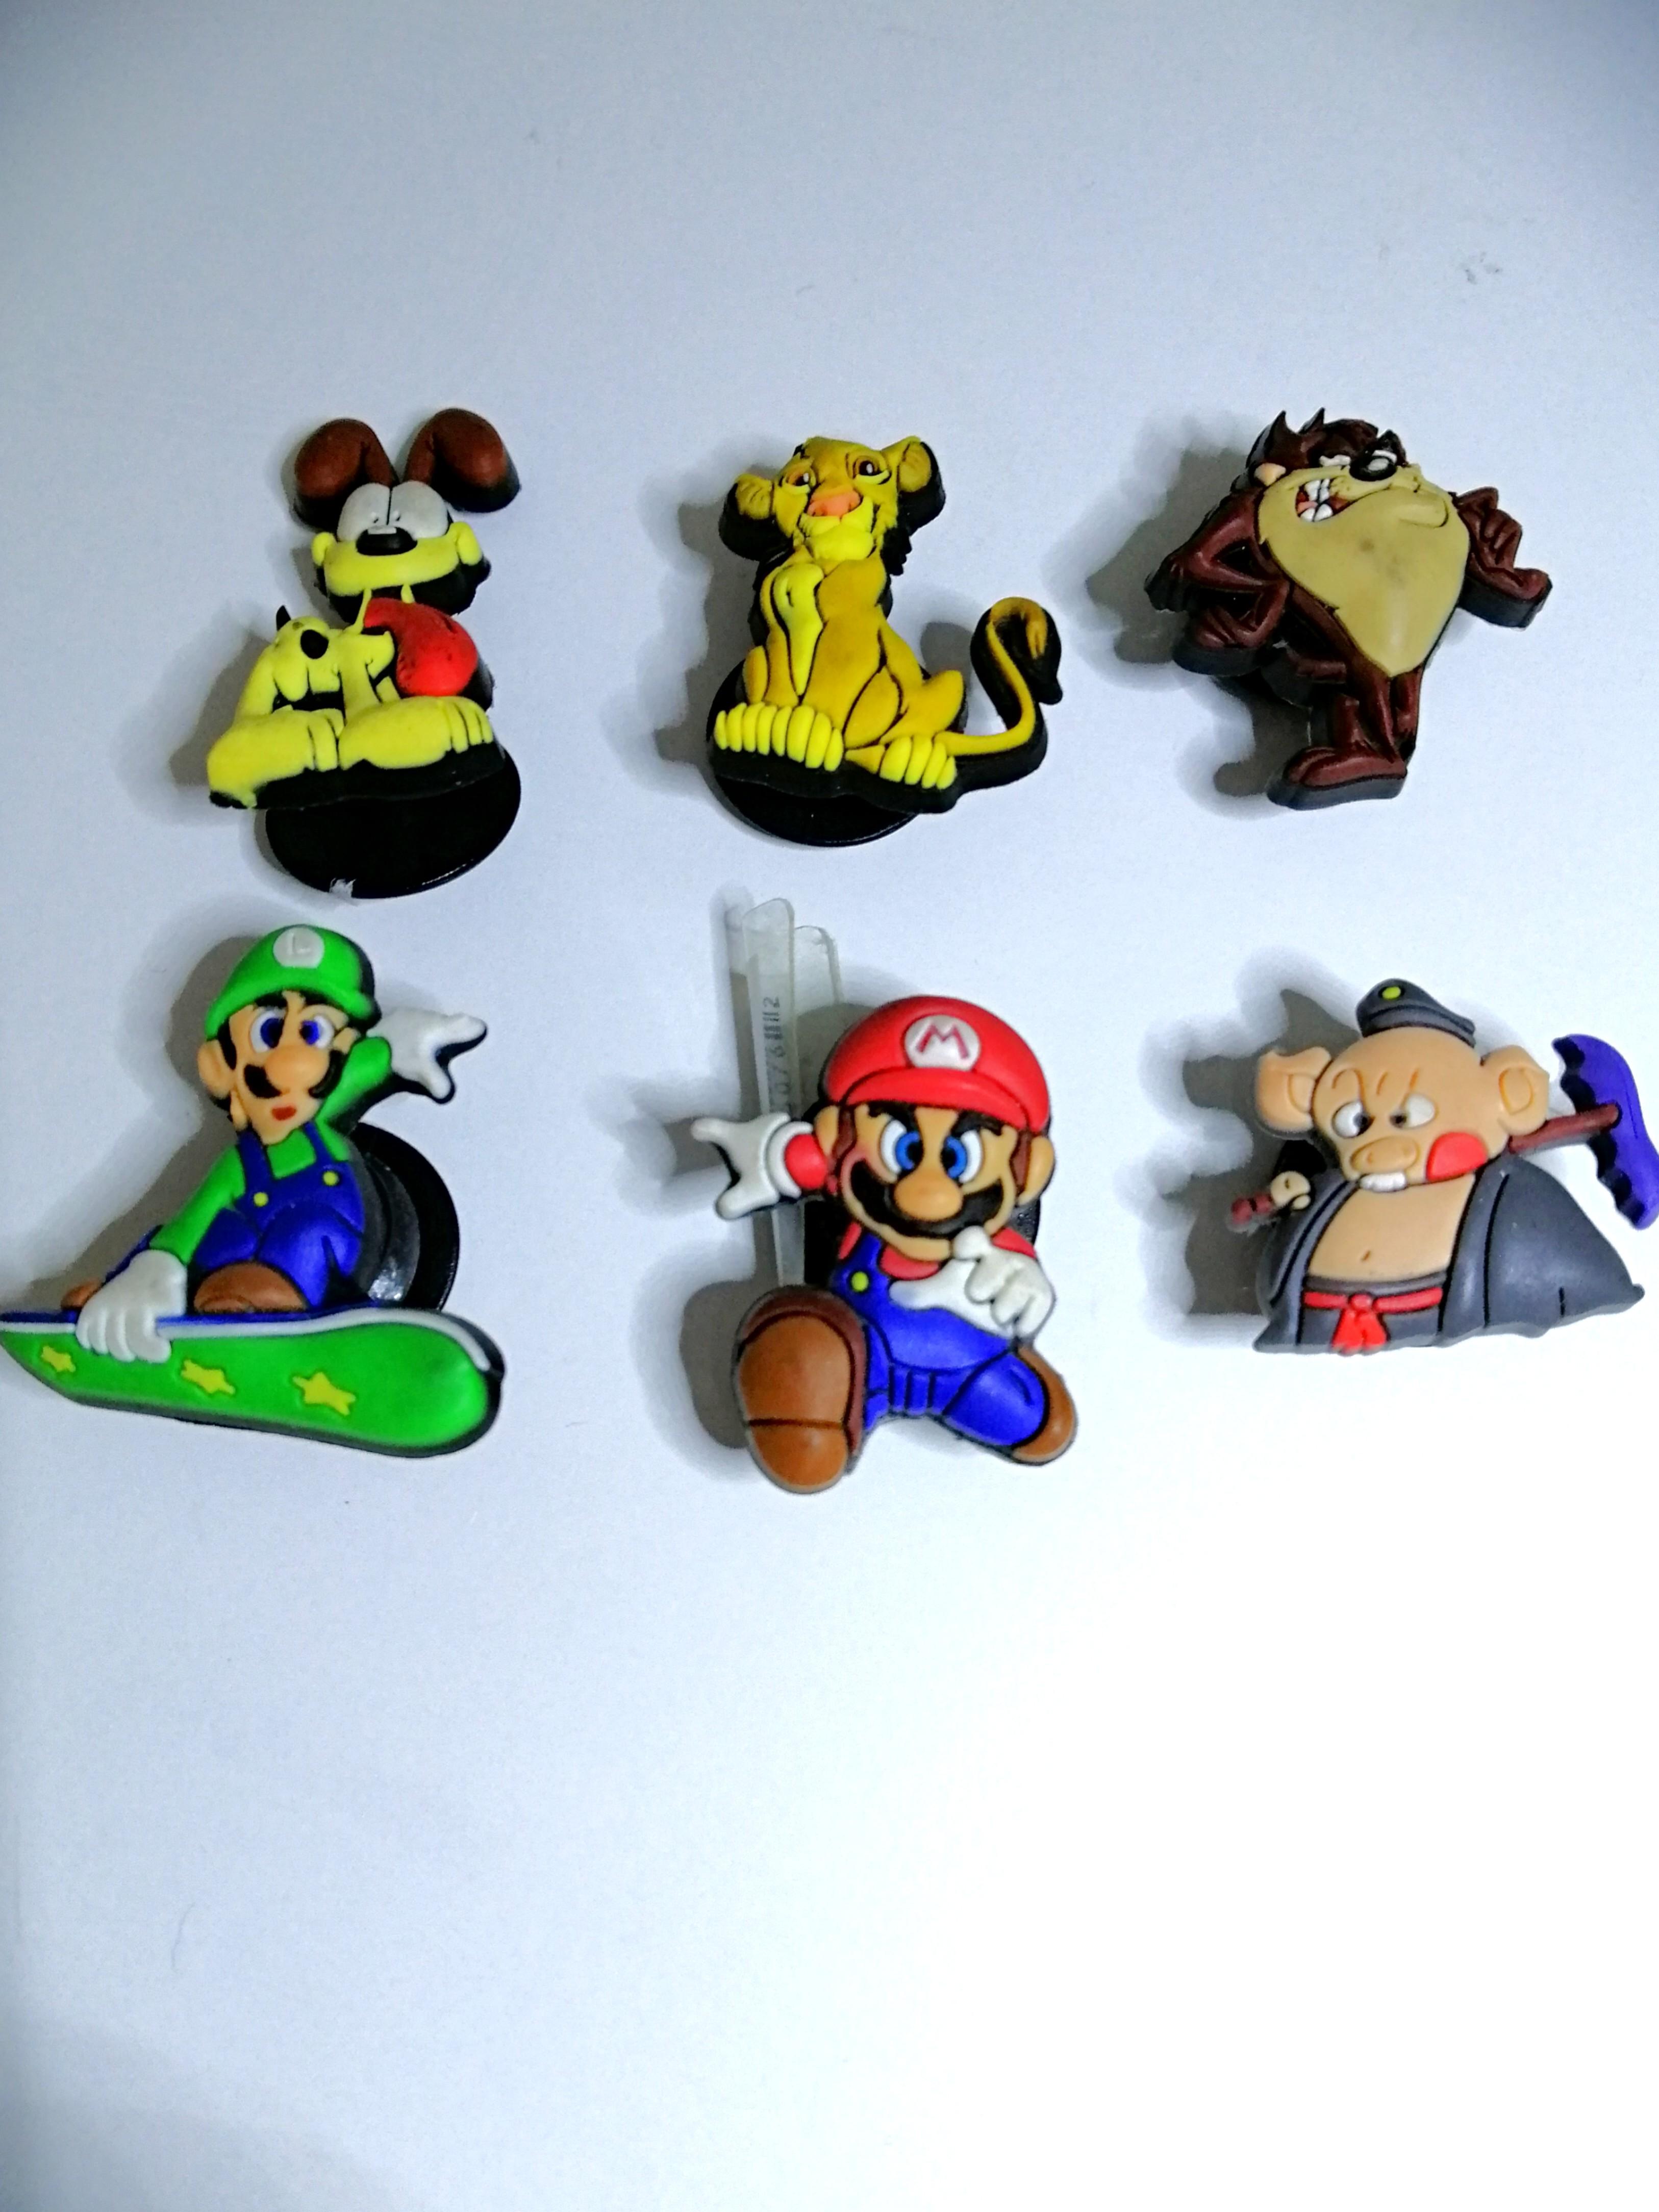 Crocs Jigbits Super Mario Luigi Oddy Tasmanian Devil Lion King